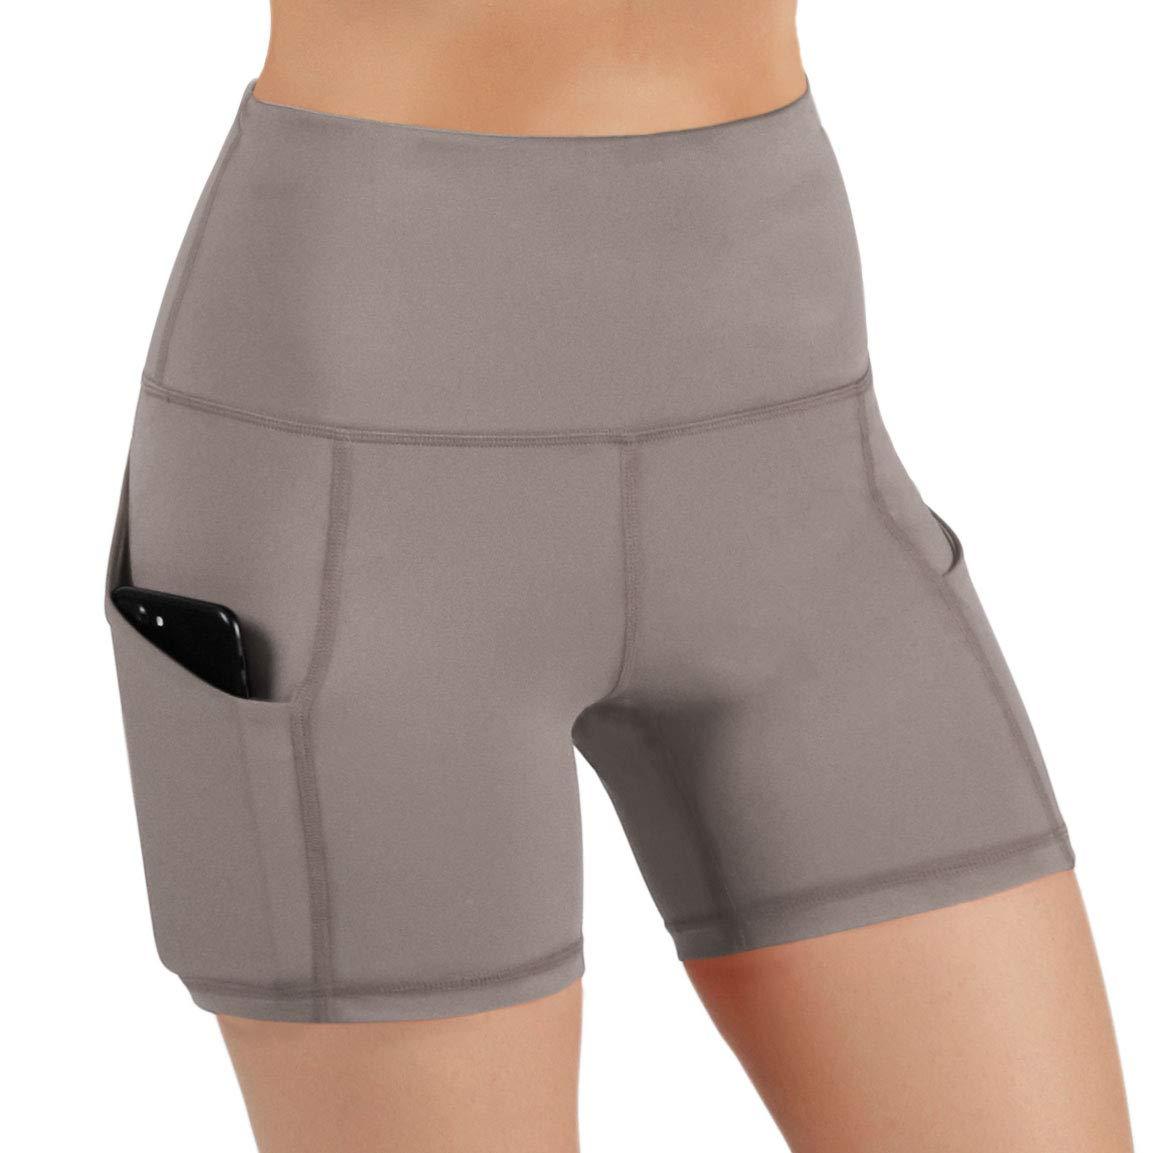 ODODOS High Waist Out Pocket Yoga Short Tummy Control Workout Running Athletic Non See-Through Yoga Shorts,DarkBeige,X-Small